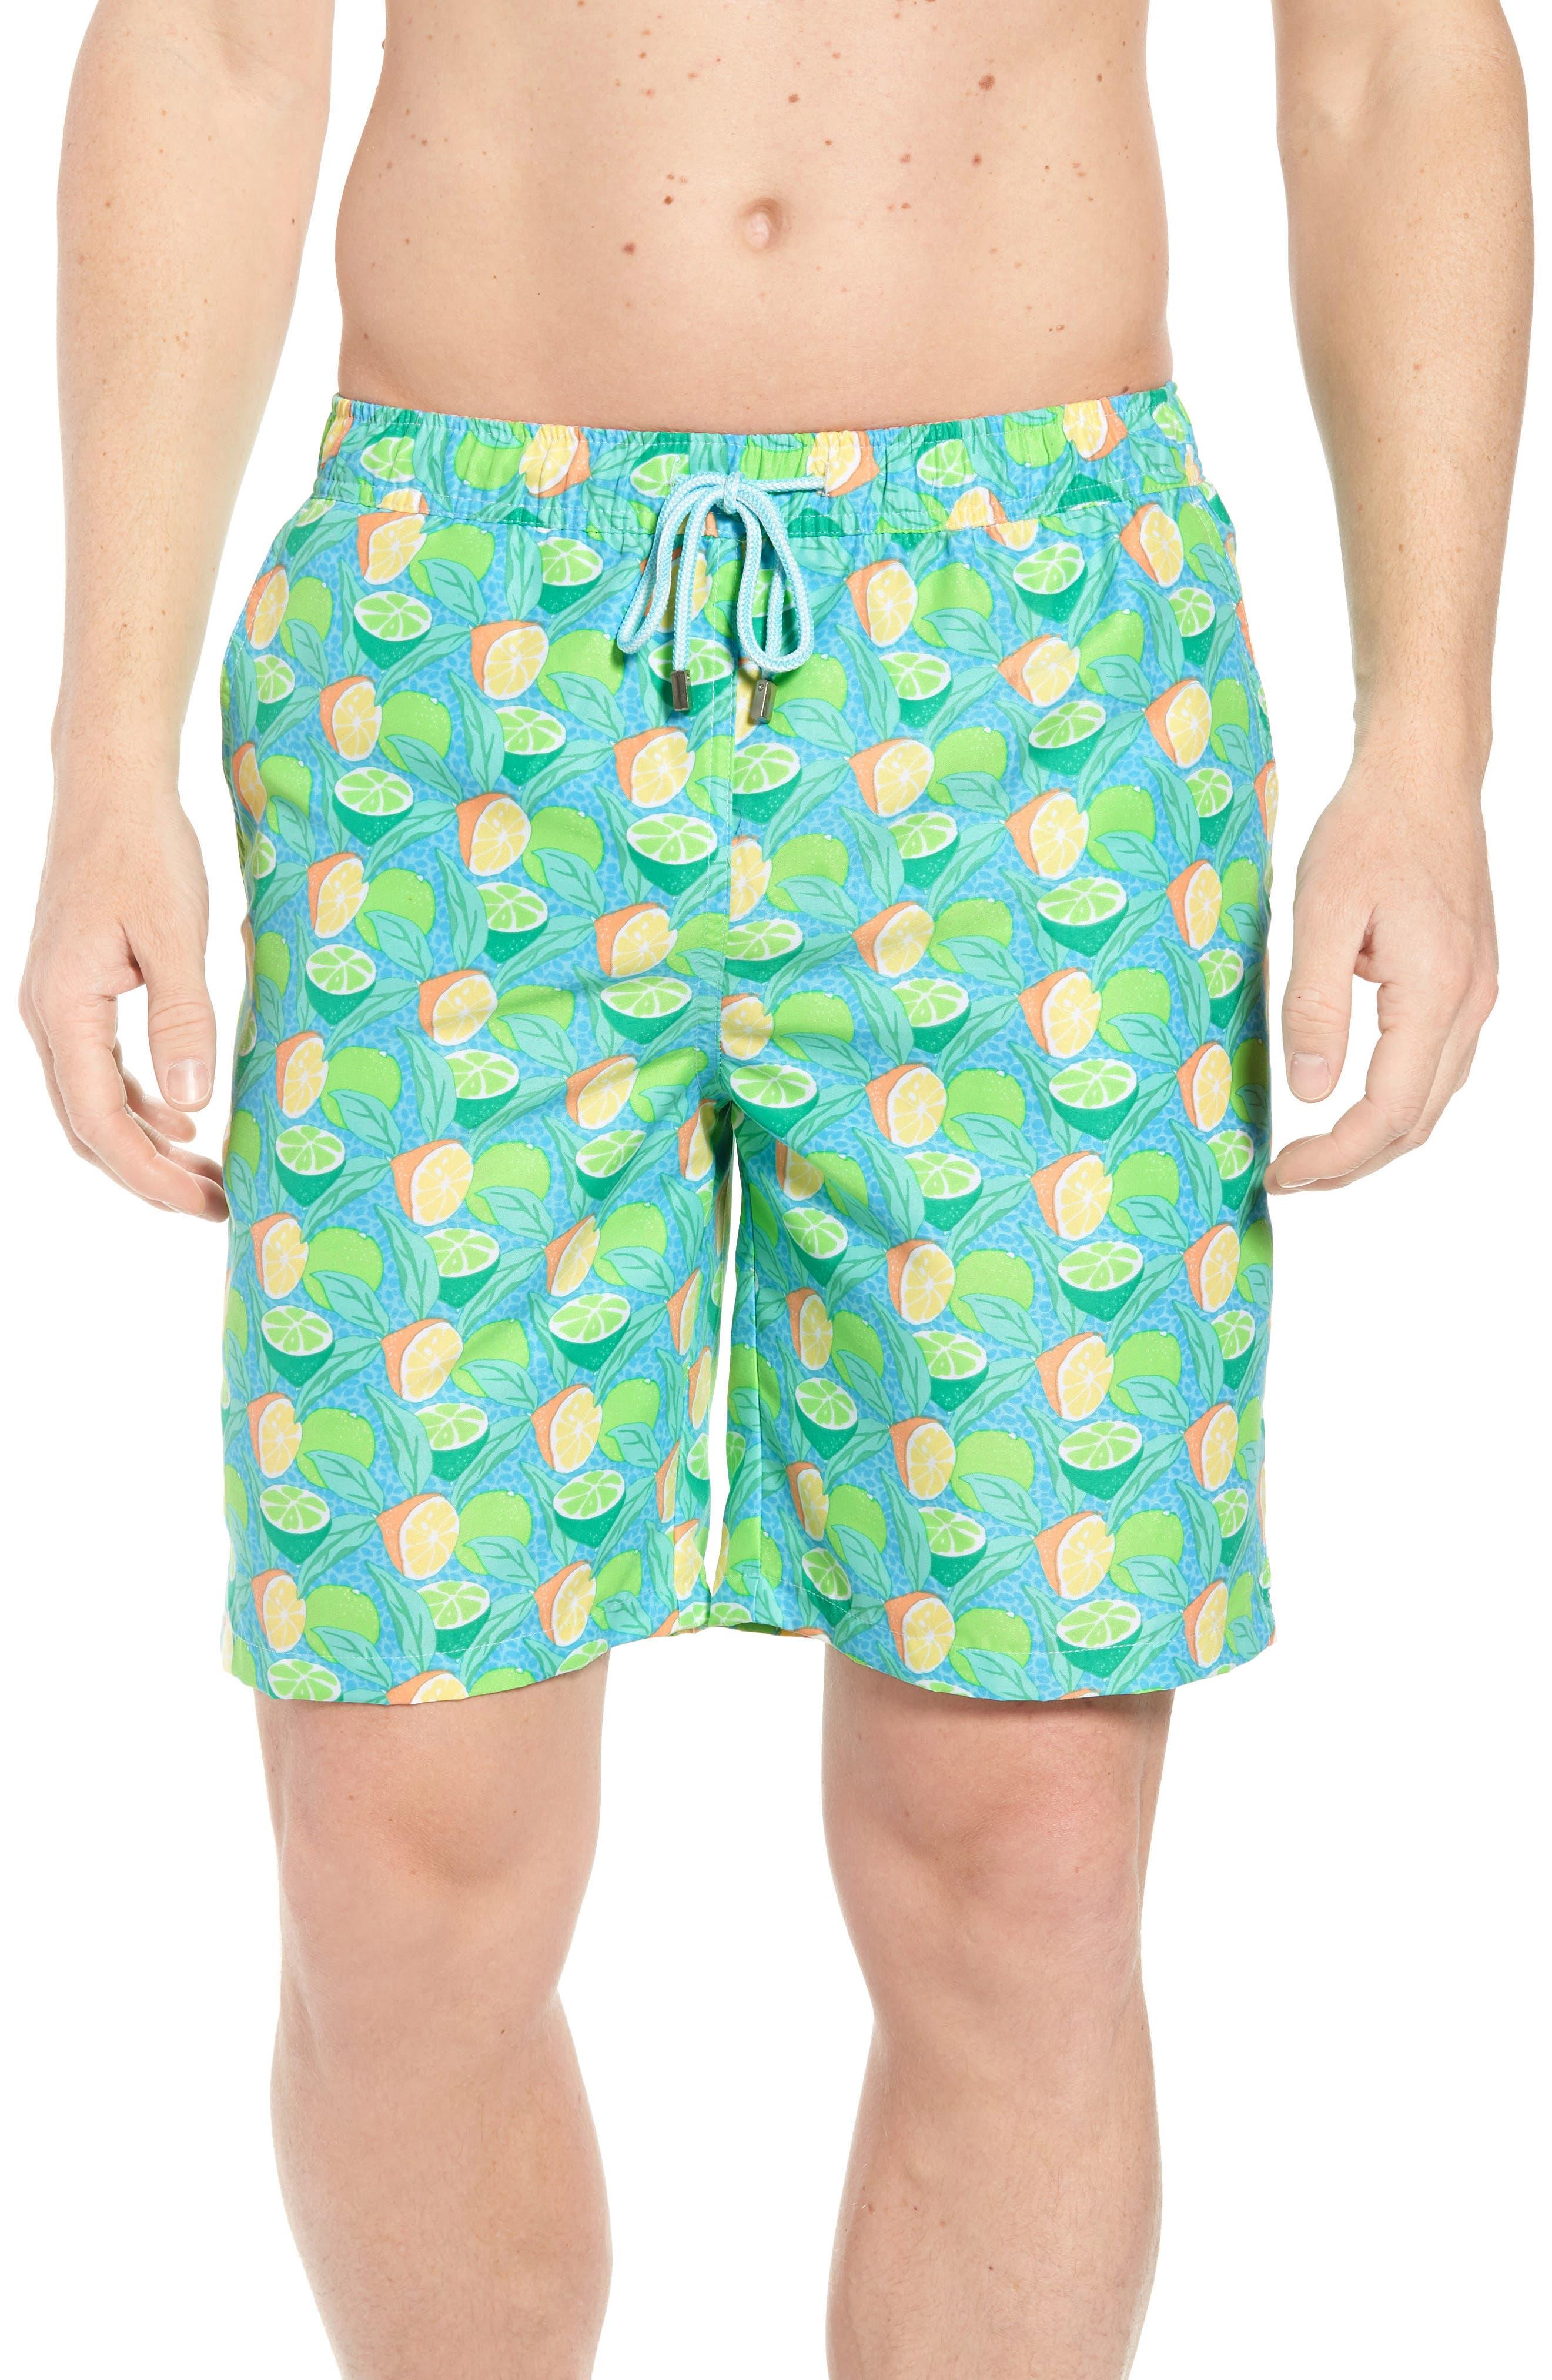 Sour Lemons Swim Trunks,                         Main,                         color, Watercress